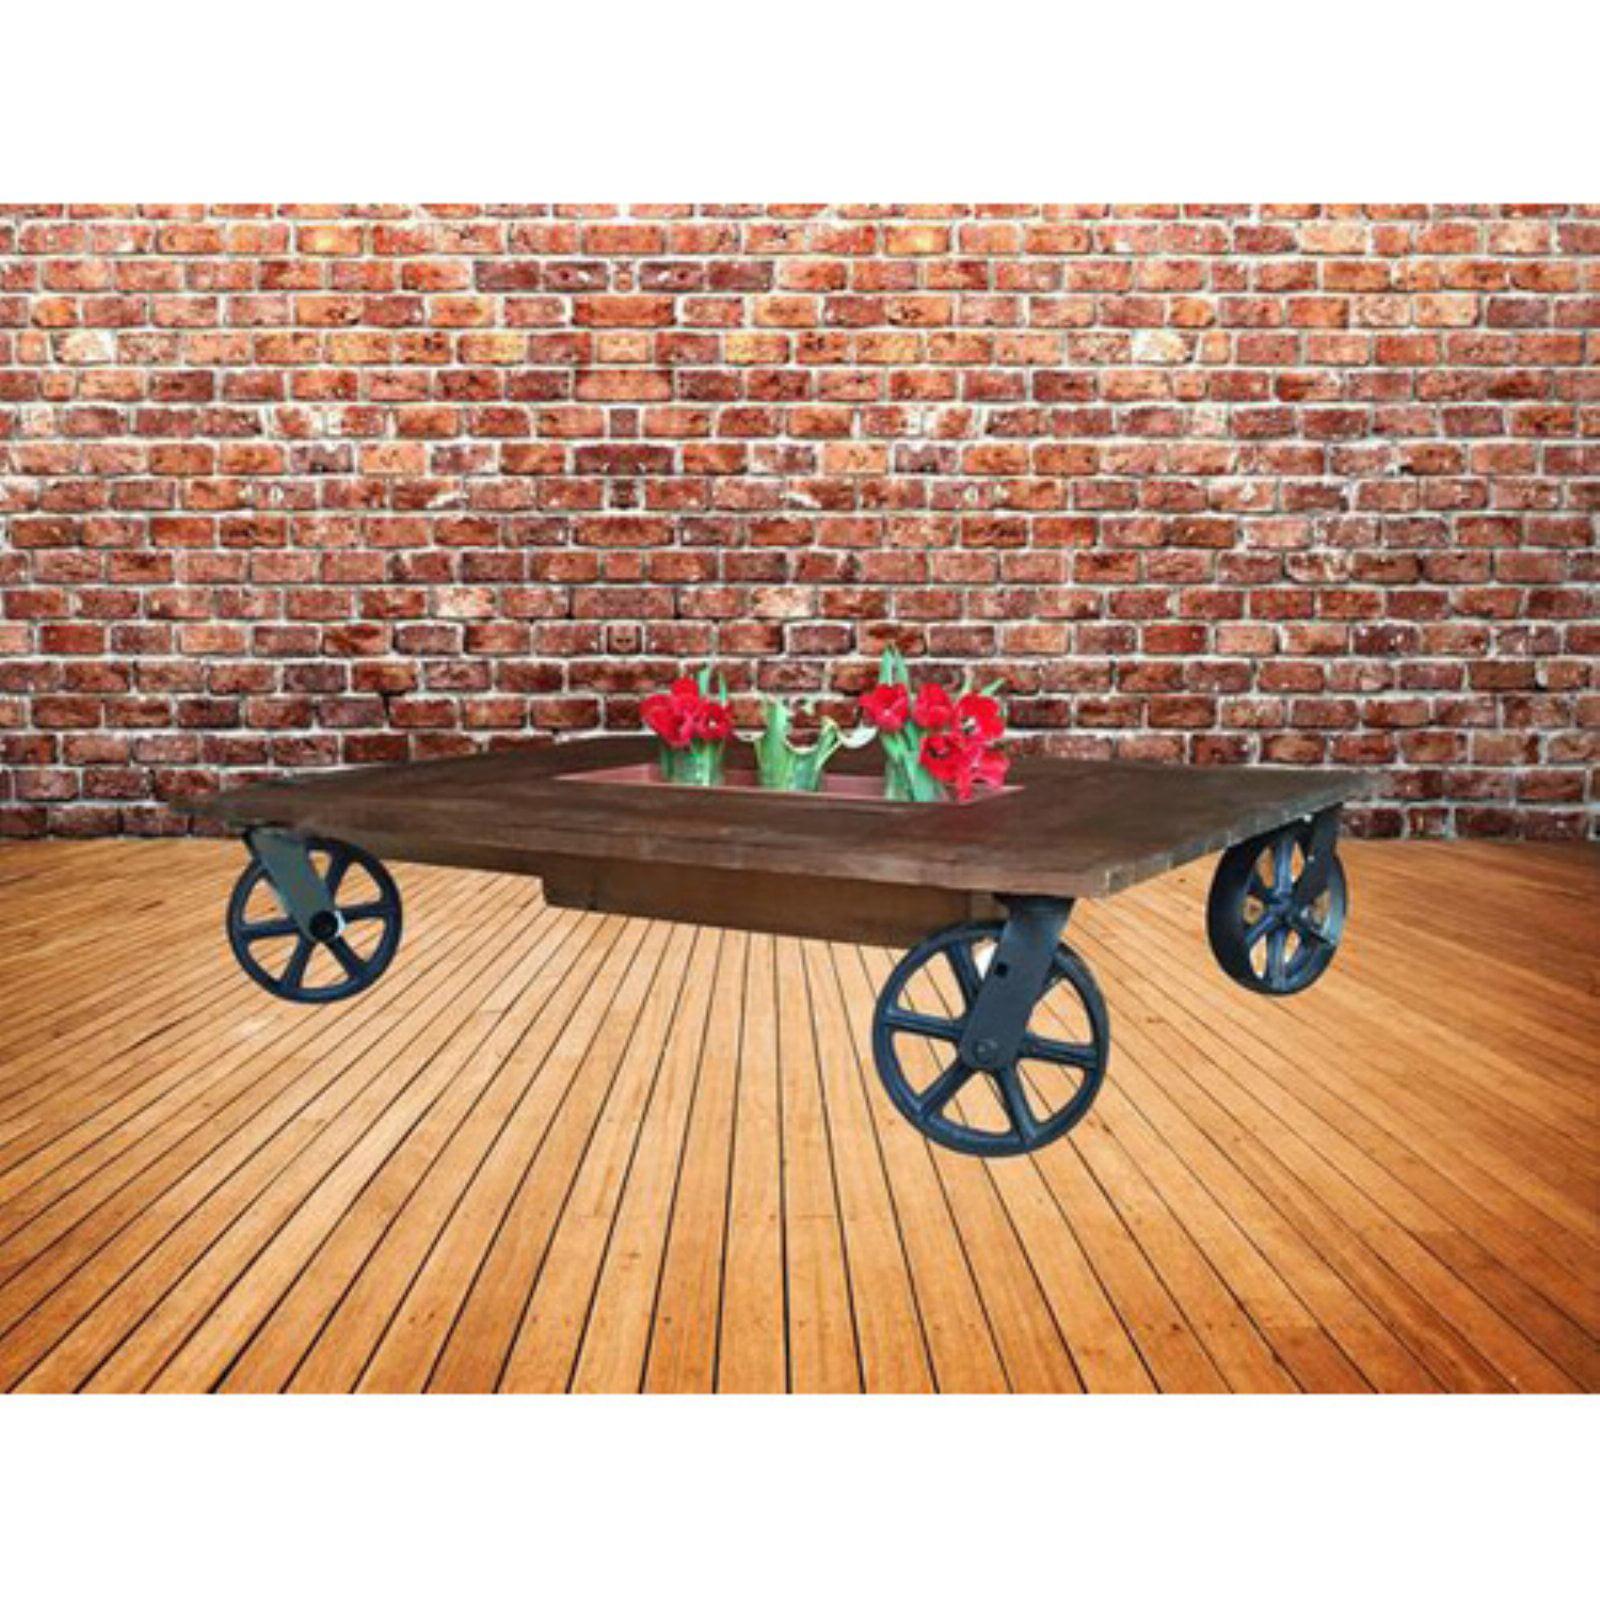 LadyBagsSf Single Planter with Black Metal Wheels Indoor Coffee Table